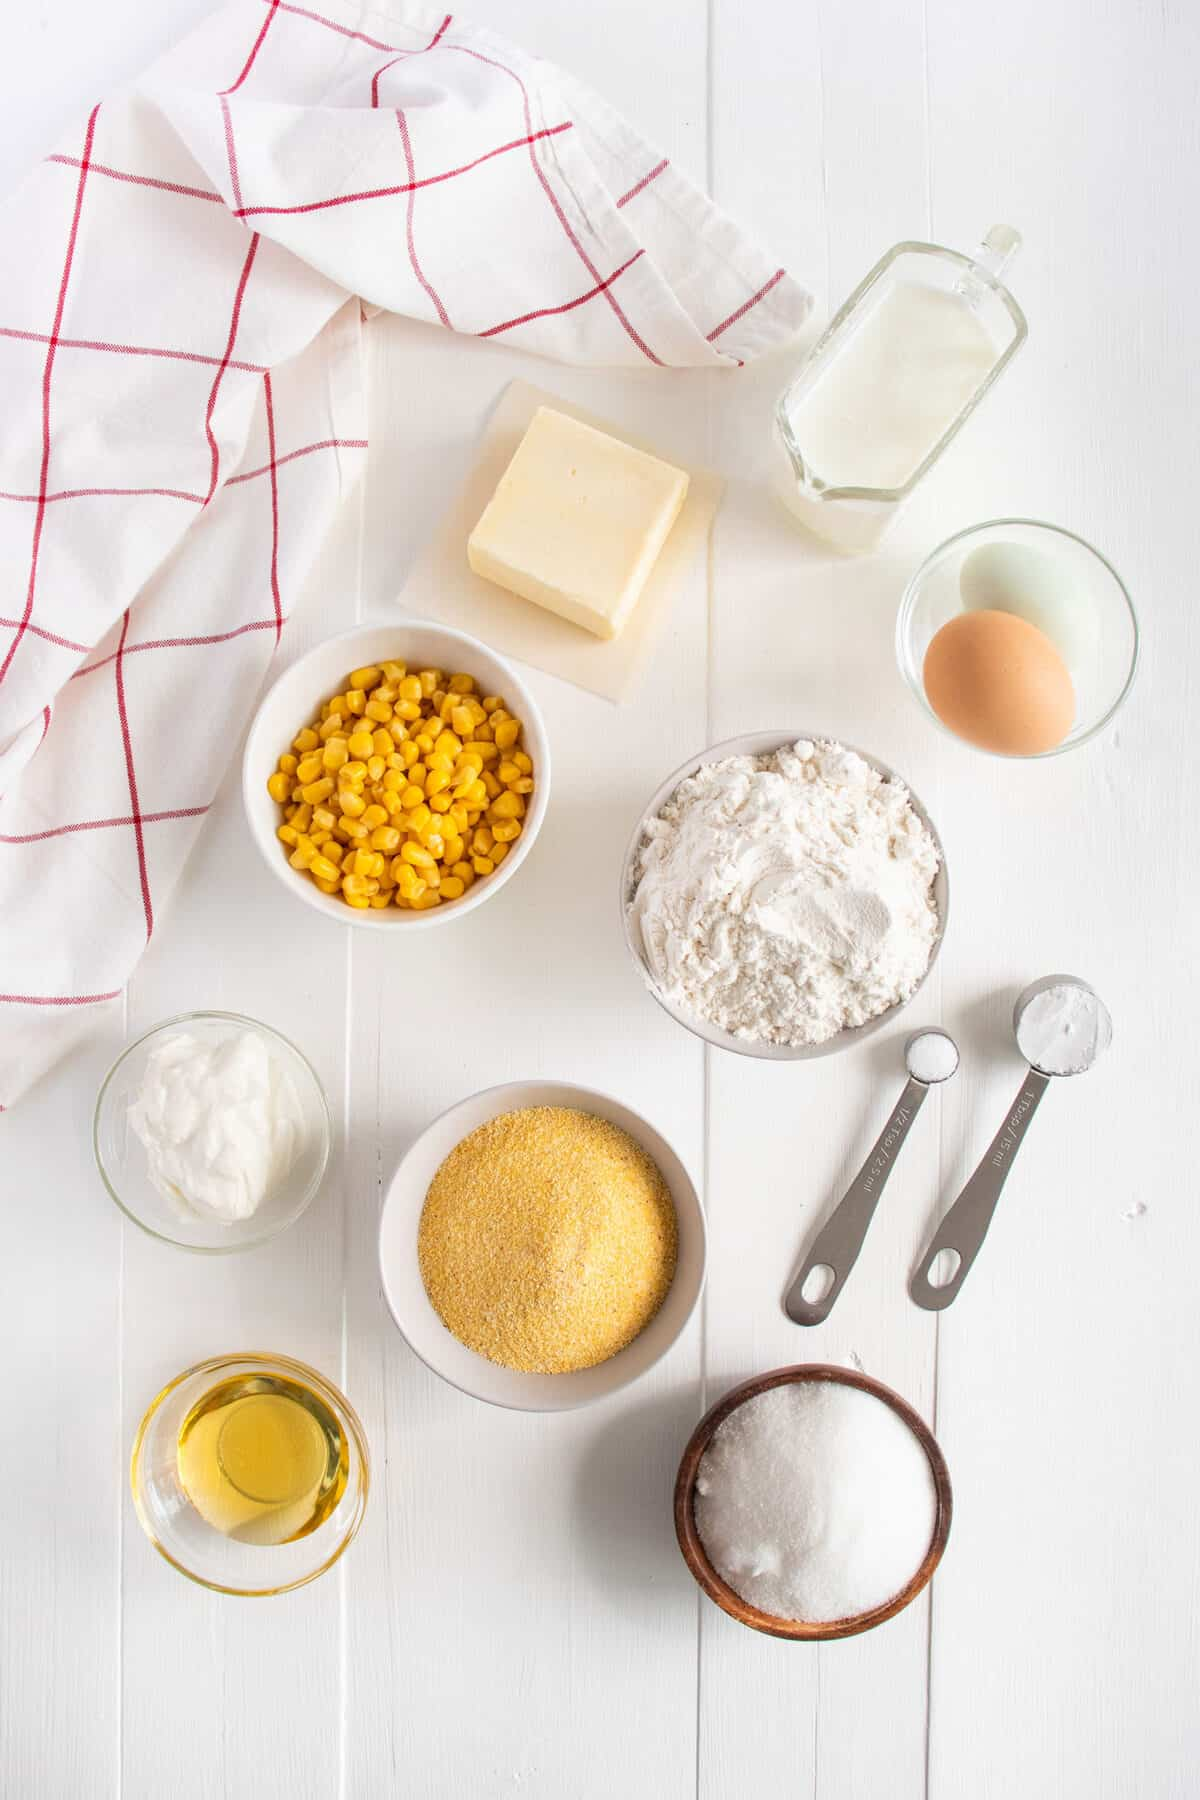 ingredients for cornbread muffins